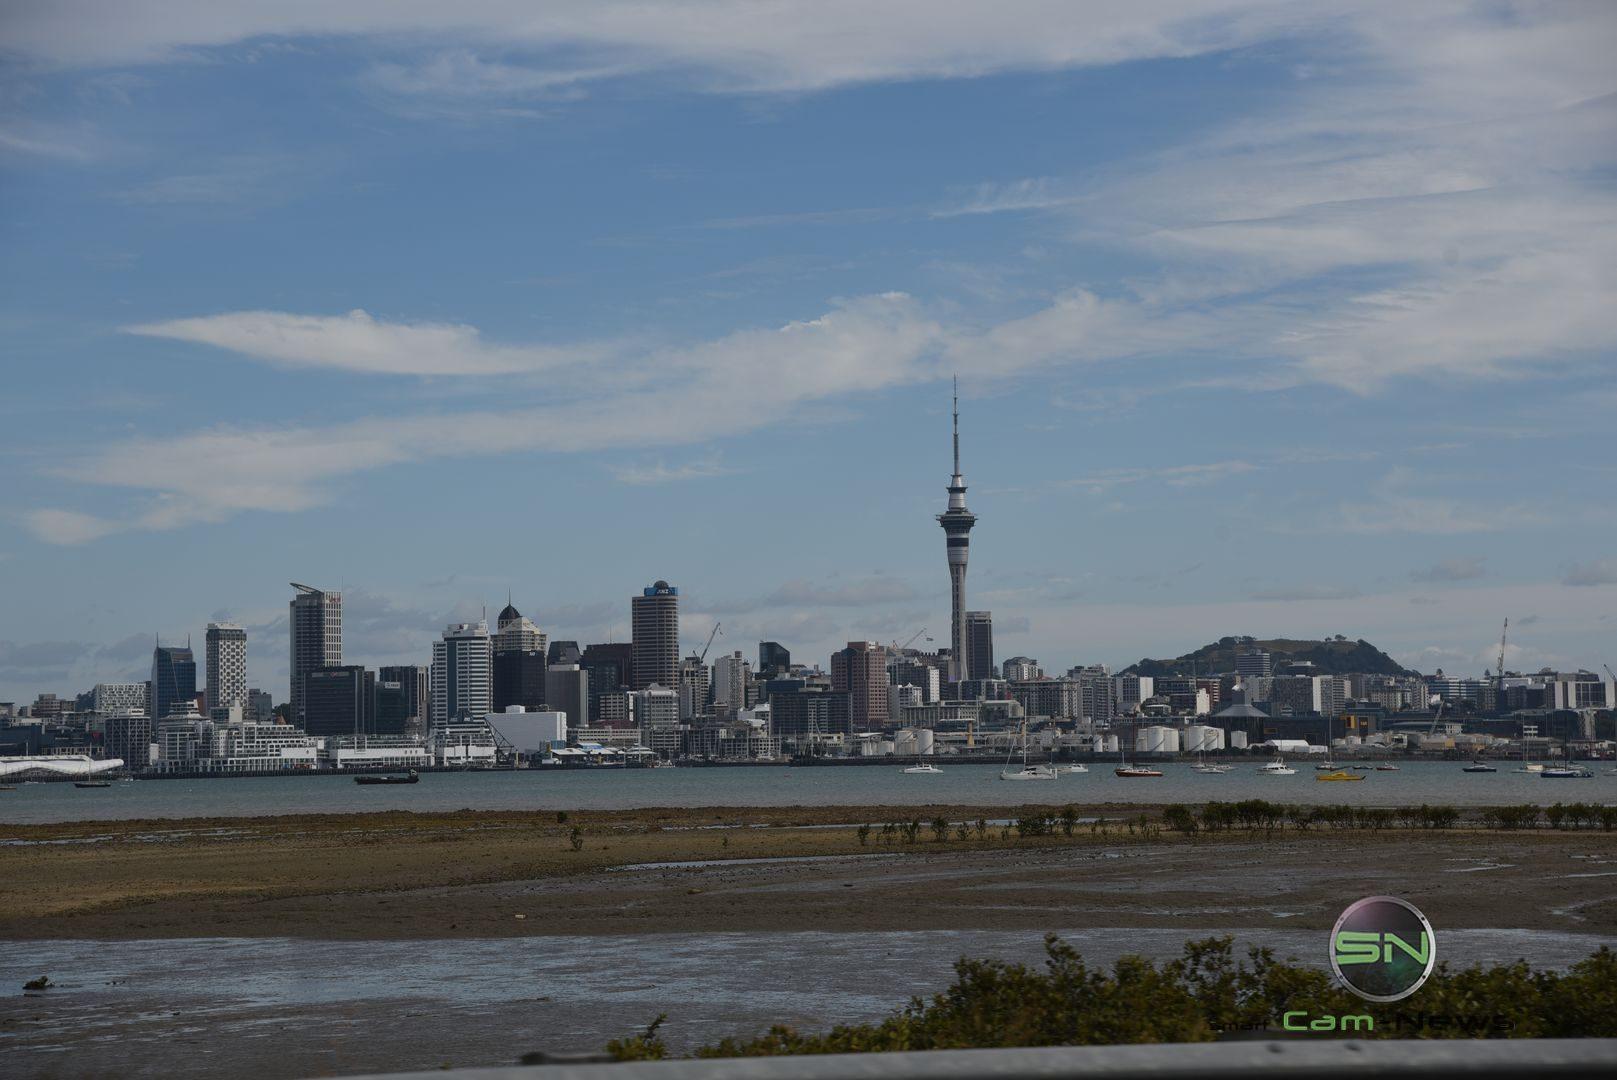 City Neuseeland - Nikon D750 - SmartCamNews